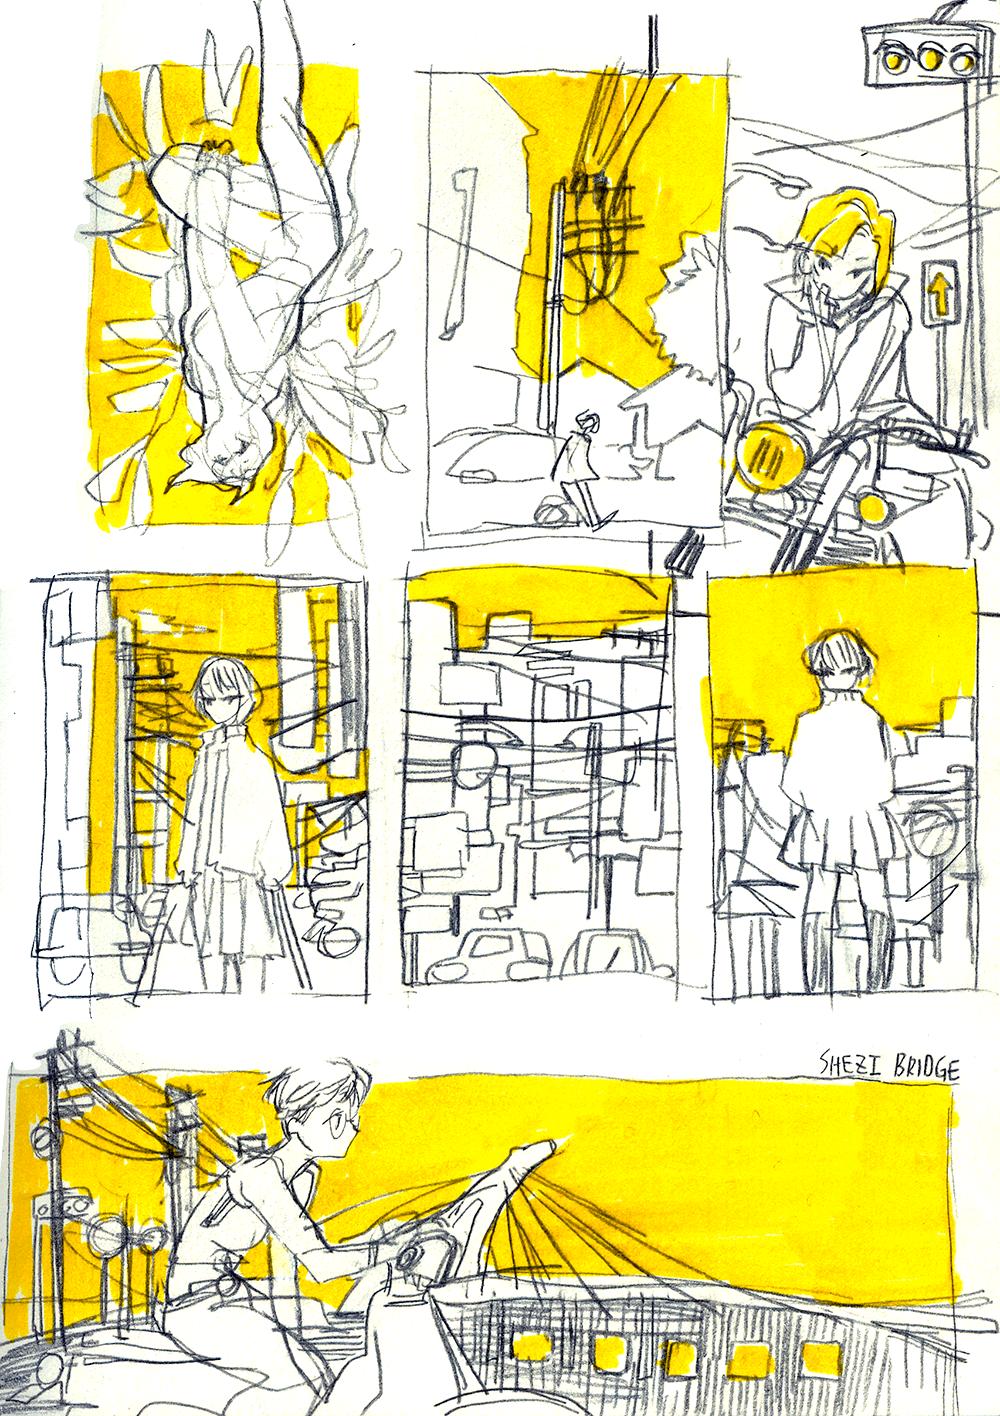 2020-Personal-sketchbook-13-_smaller